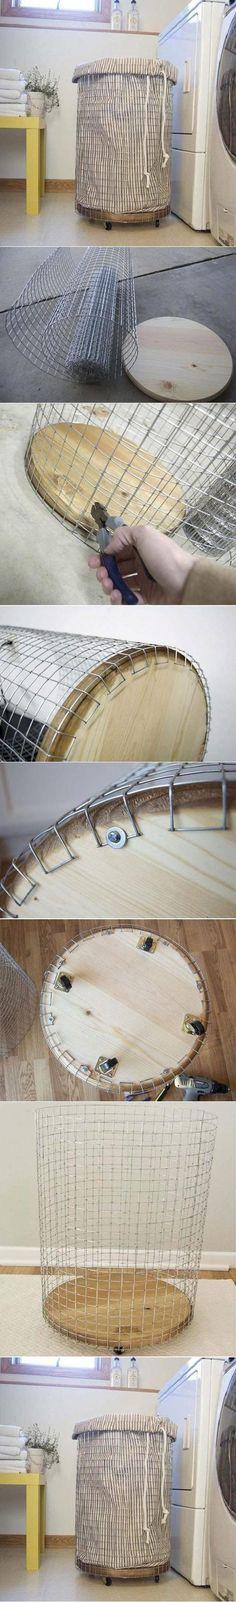 cesta-ropa-malla-metalica-muy-ingenioso-1.jpg (490×3327)